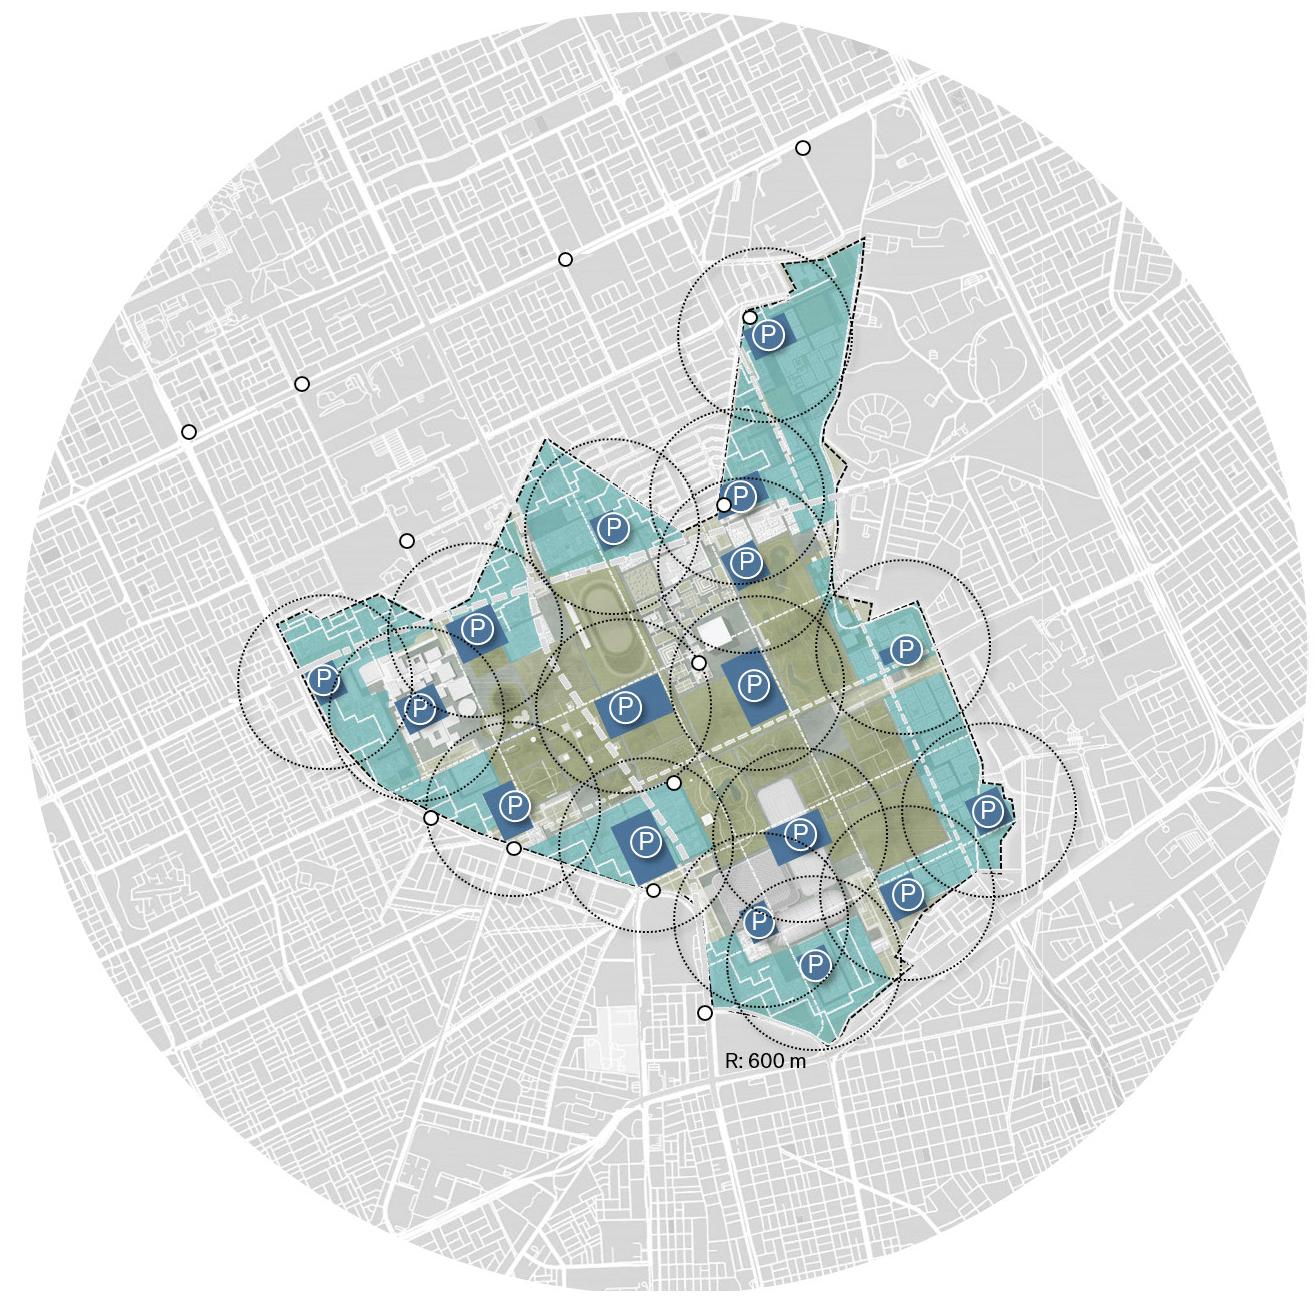 King Salman Park Parking Strategy